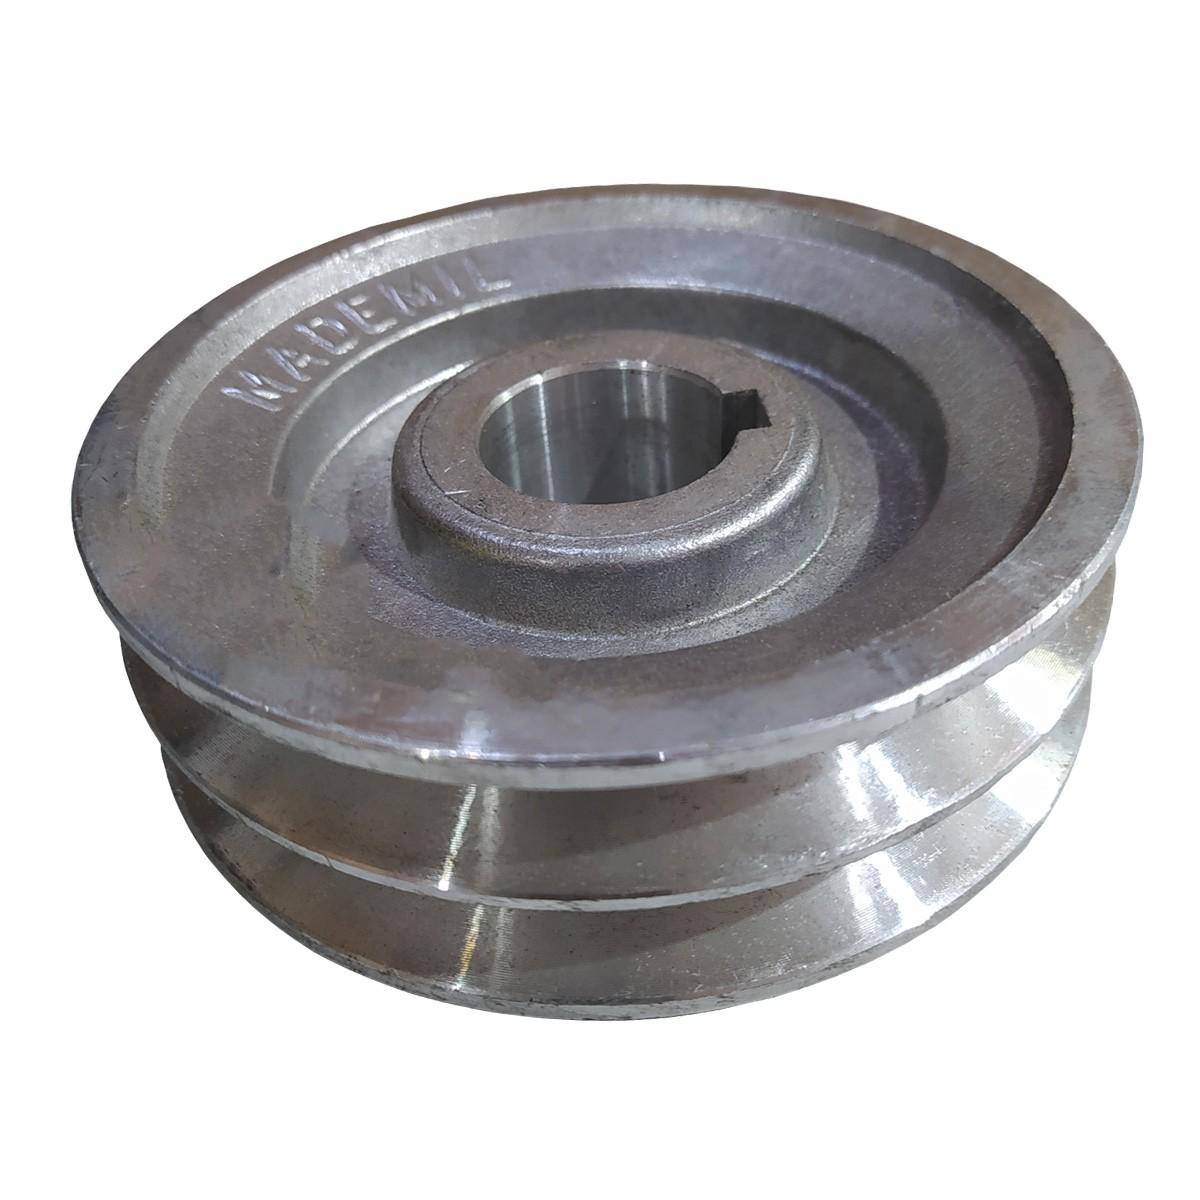 Polia De Aluminio 130mm Motor Furo 28mm 2 Canal A Chaveta